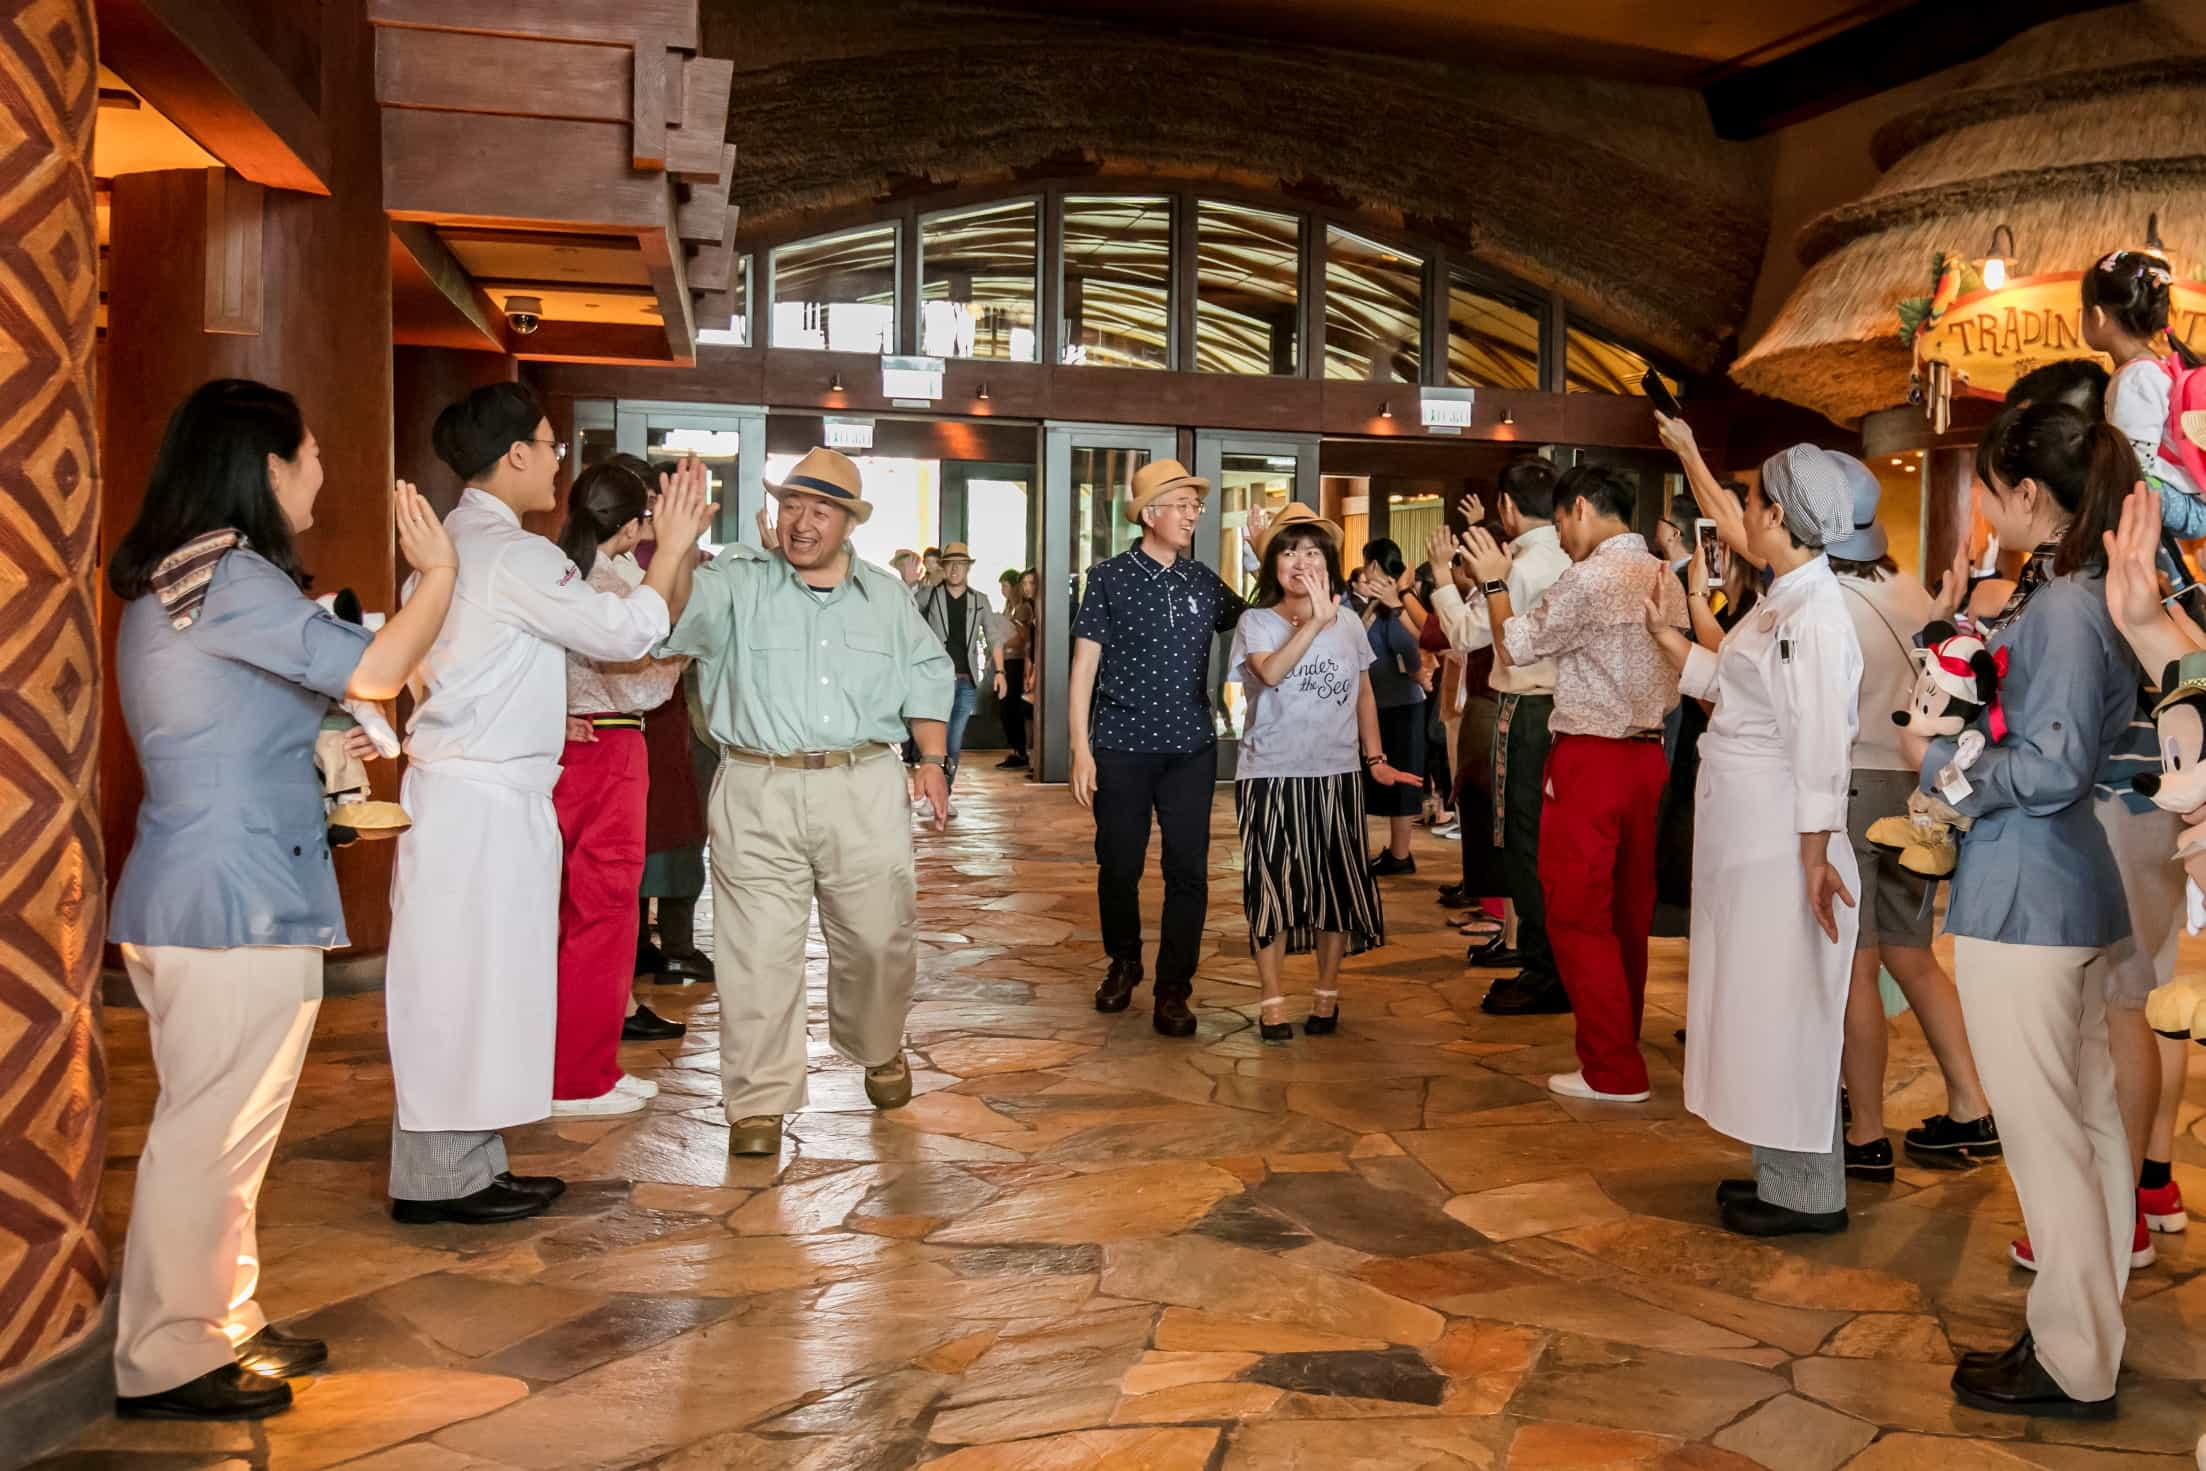 Disney Explorers Lodge now open at Hong Kong Disneyland